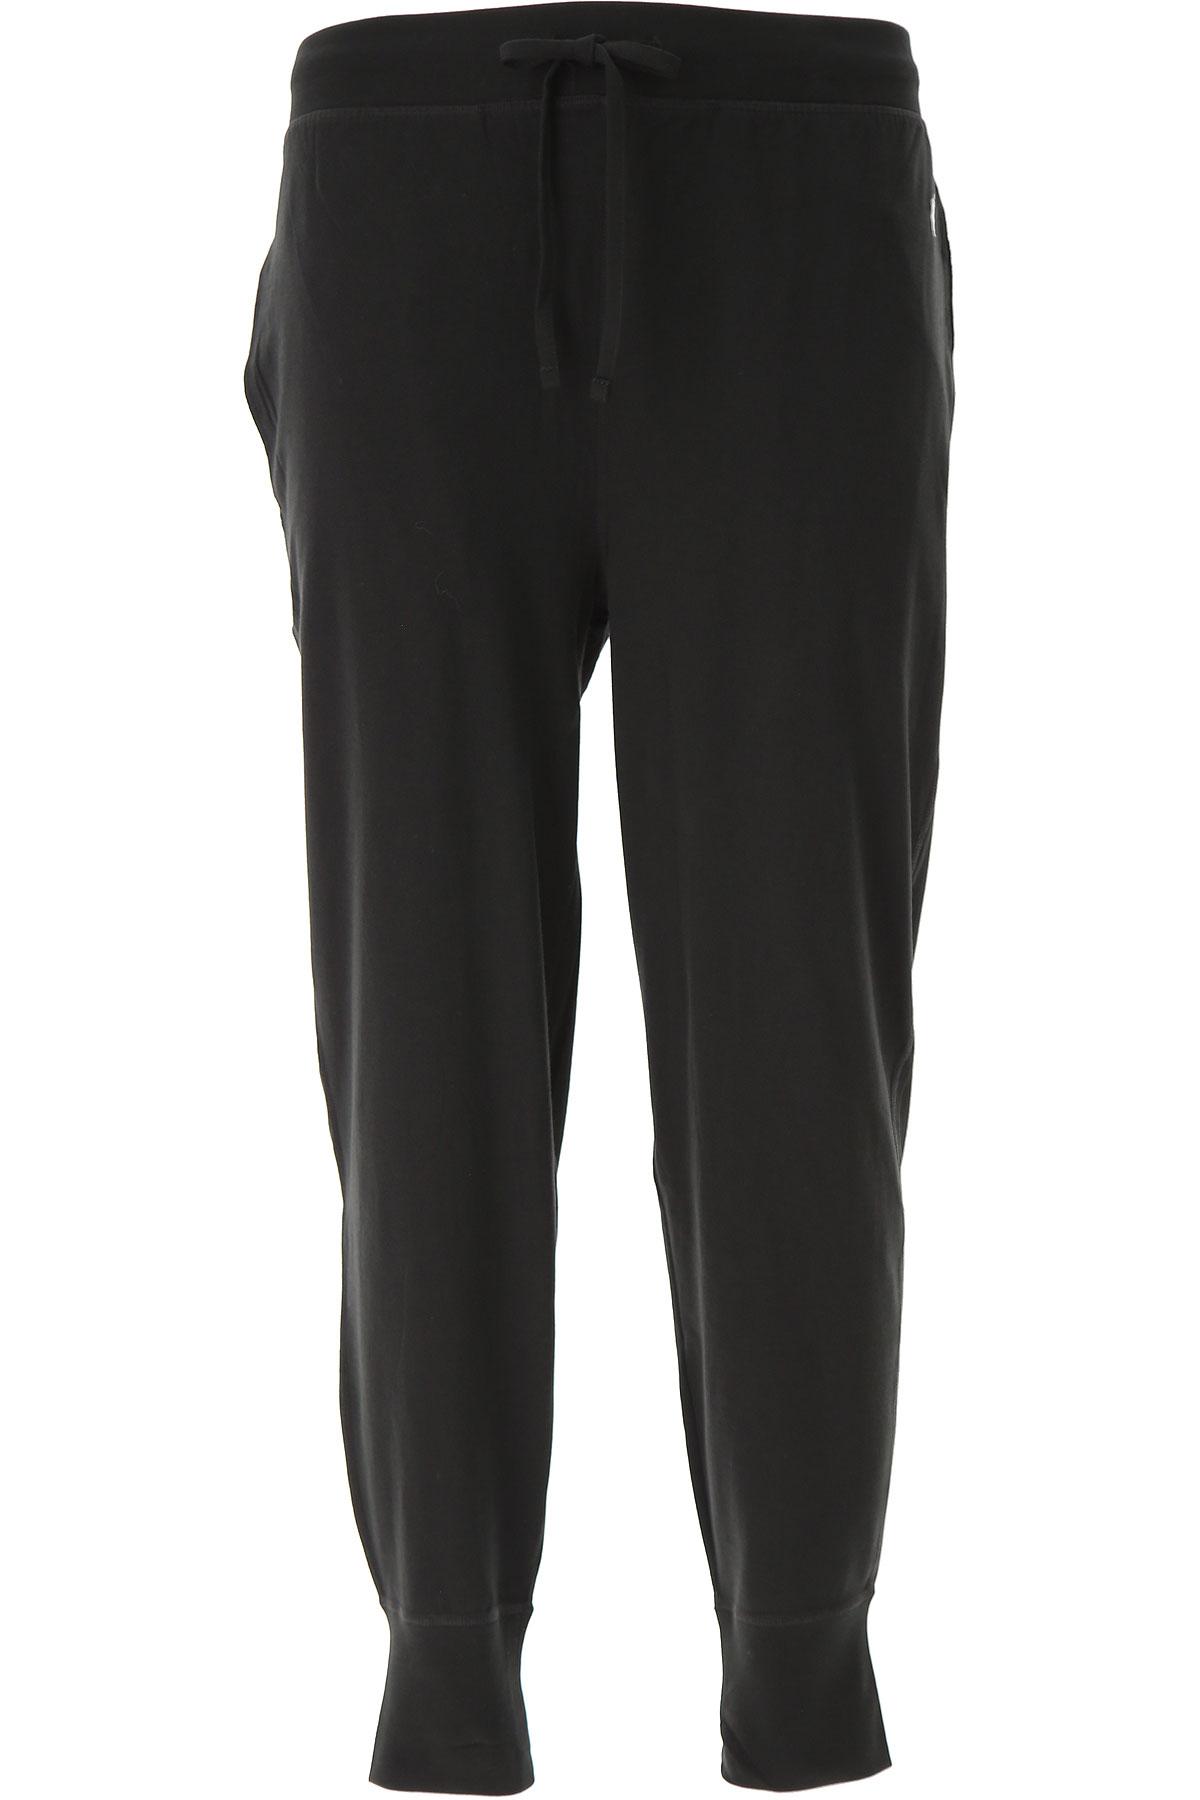 Ralph Lauren Loungewear for Men, Black, Cotton, 2019, L (EU 50) XL (EU 52) M (IT 4) L (IT 5) XL (IT 6)